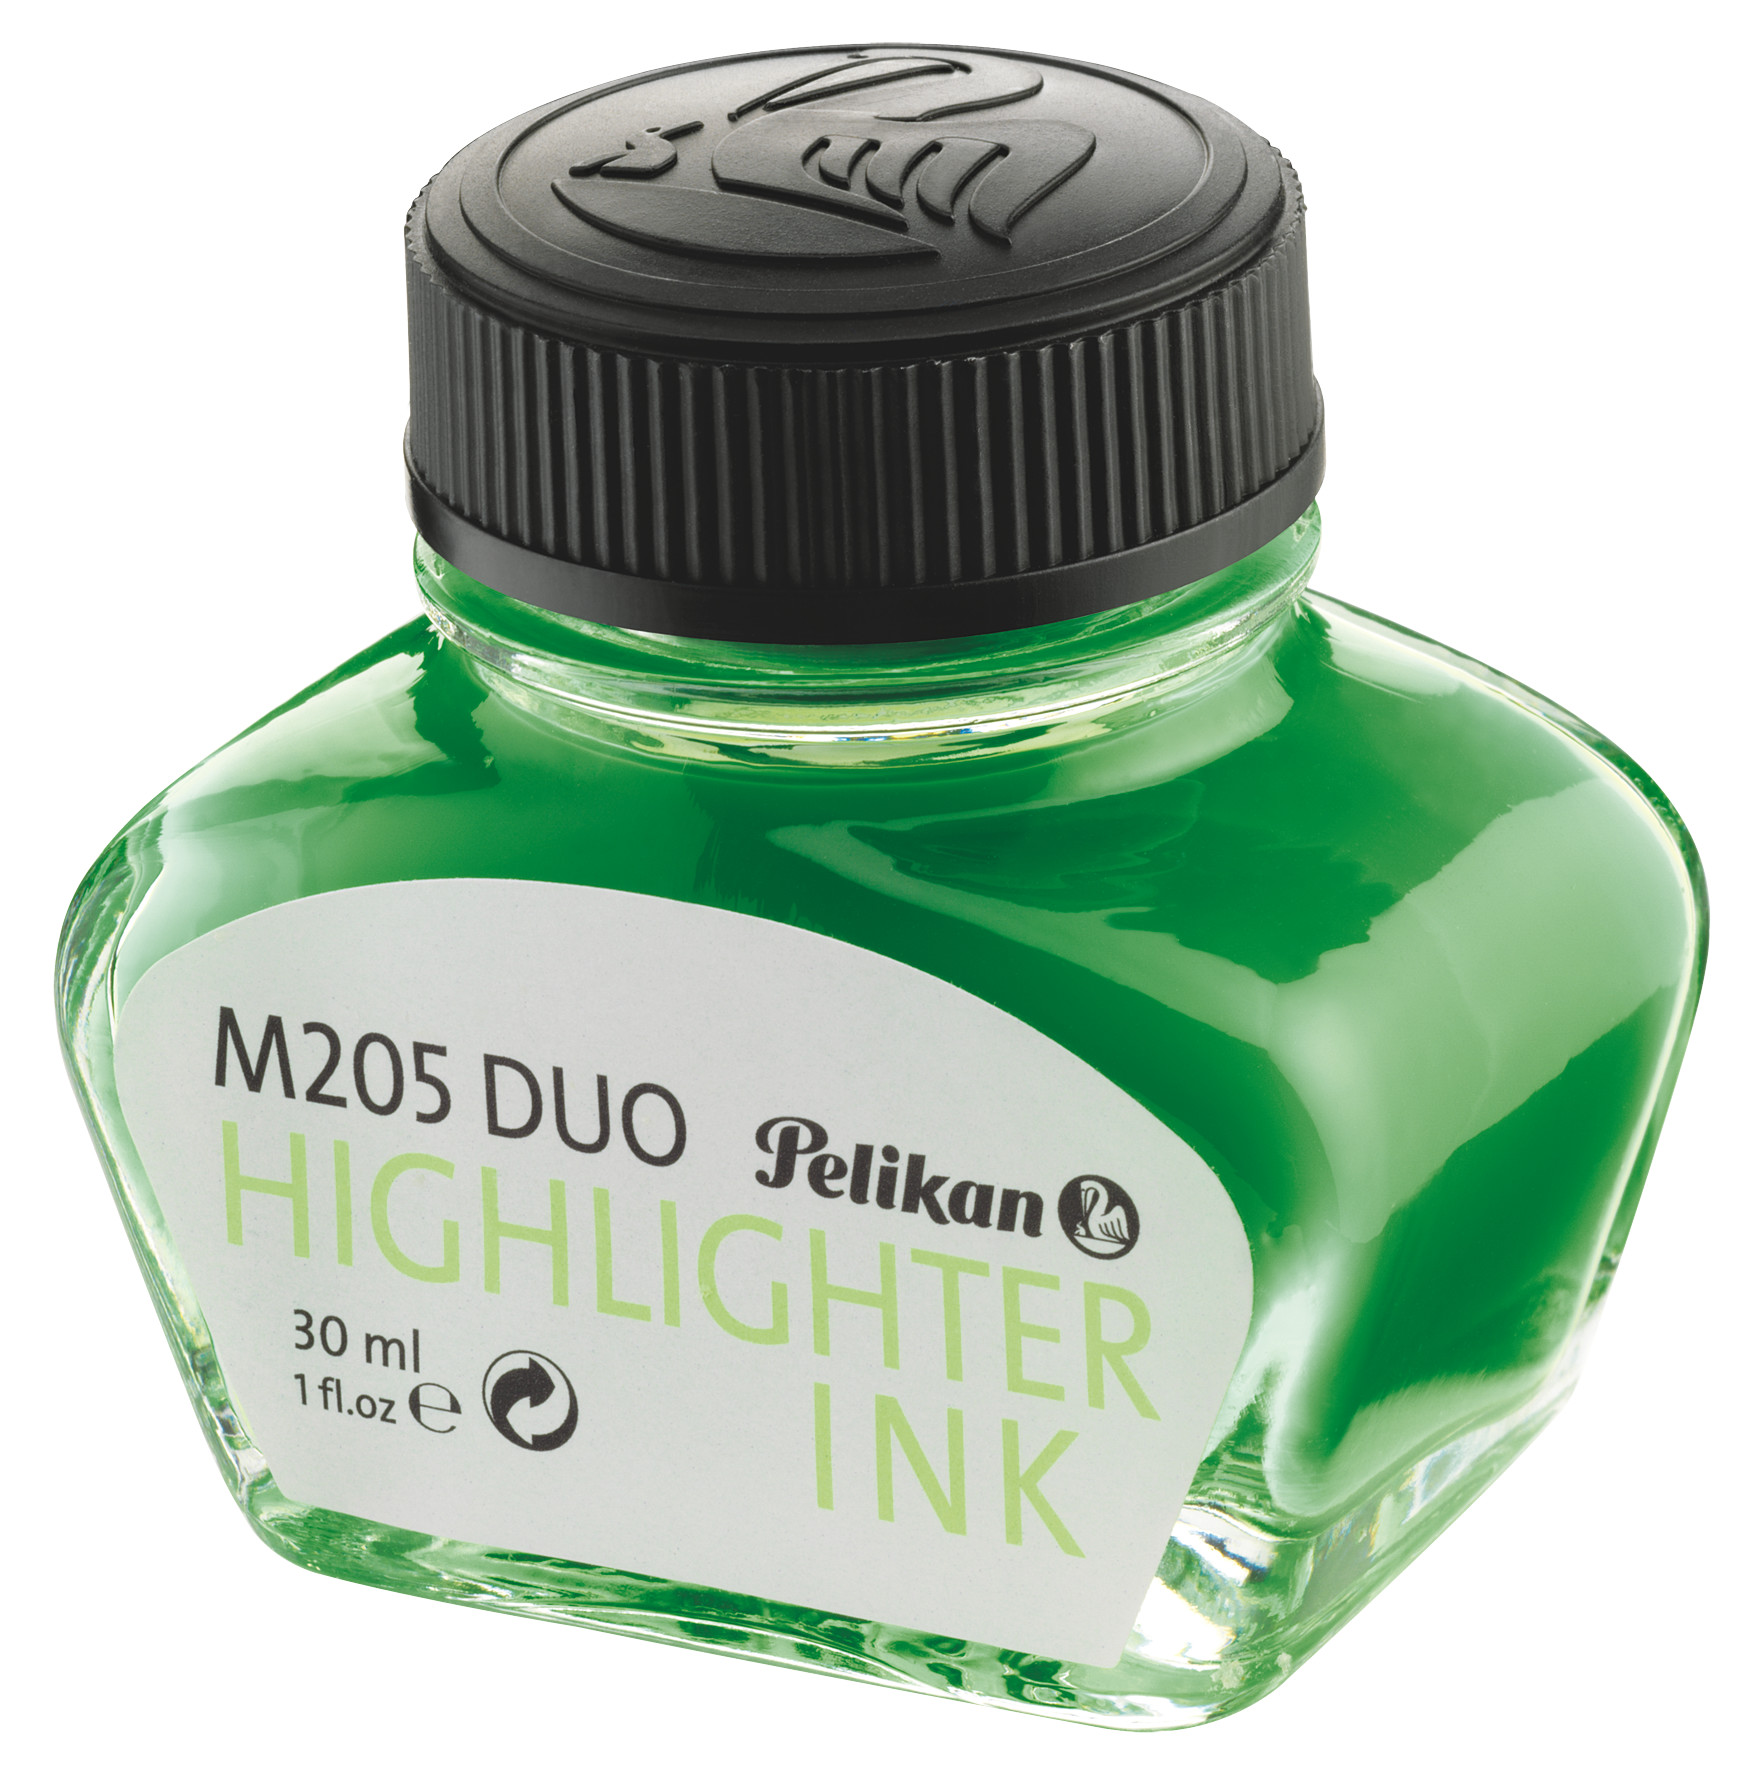 Pelikan Highligther Ink Neongreen 30ml